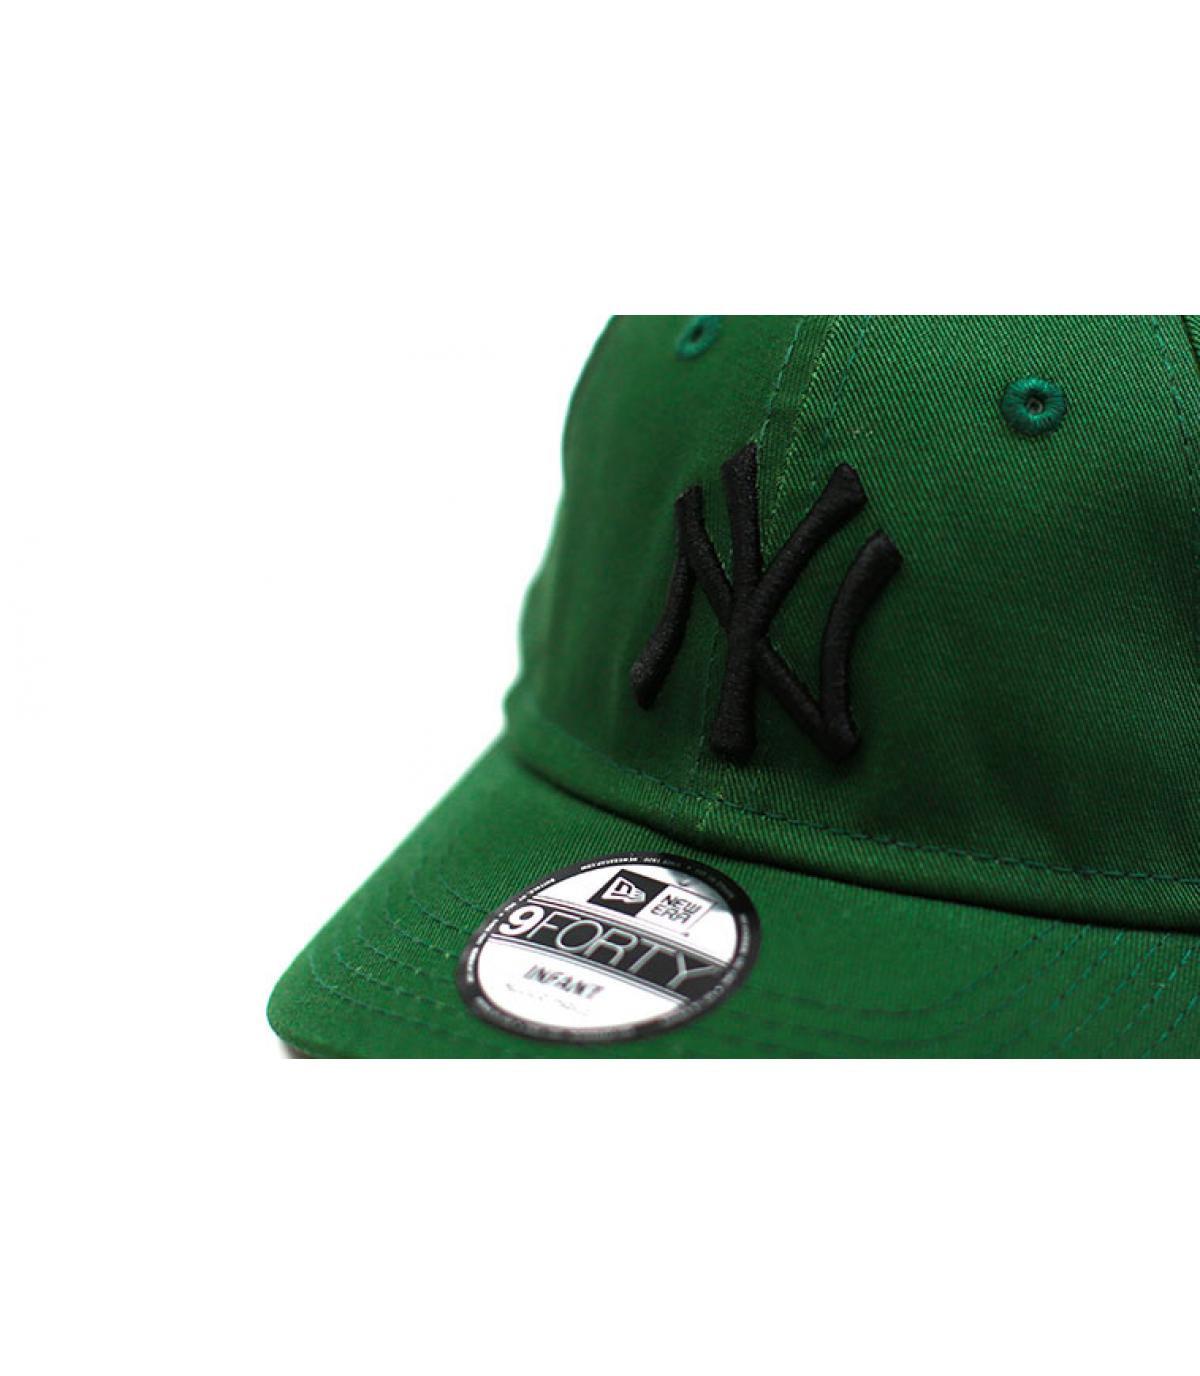 Details Infant League Ess NY green black - afbeeling 3